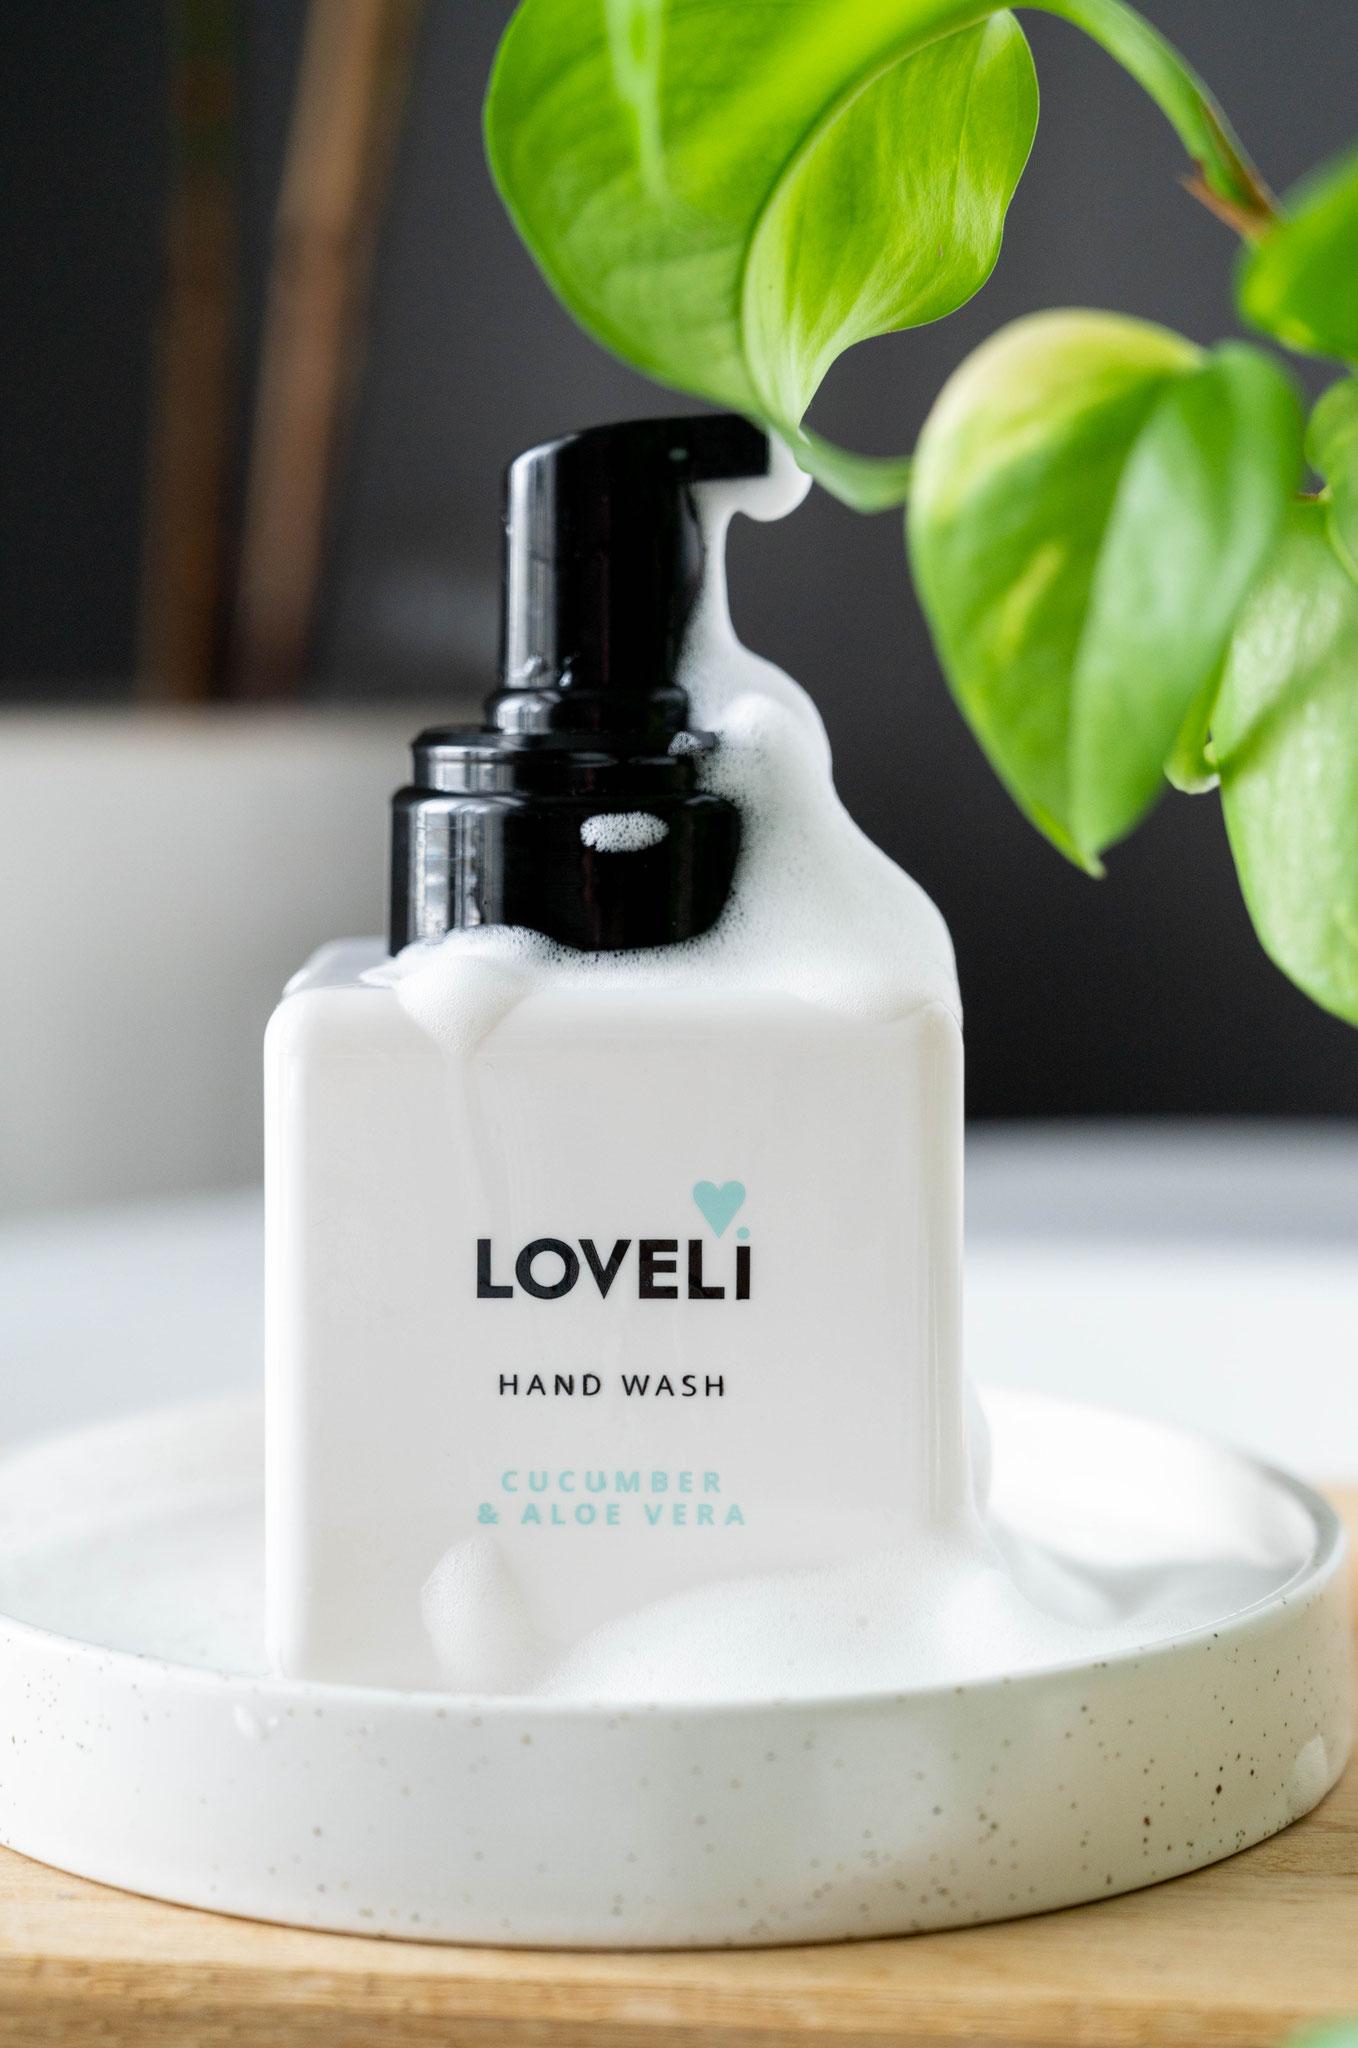 Loveli handwash